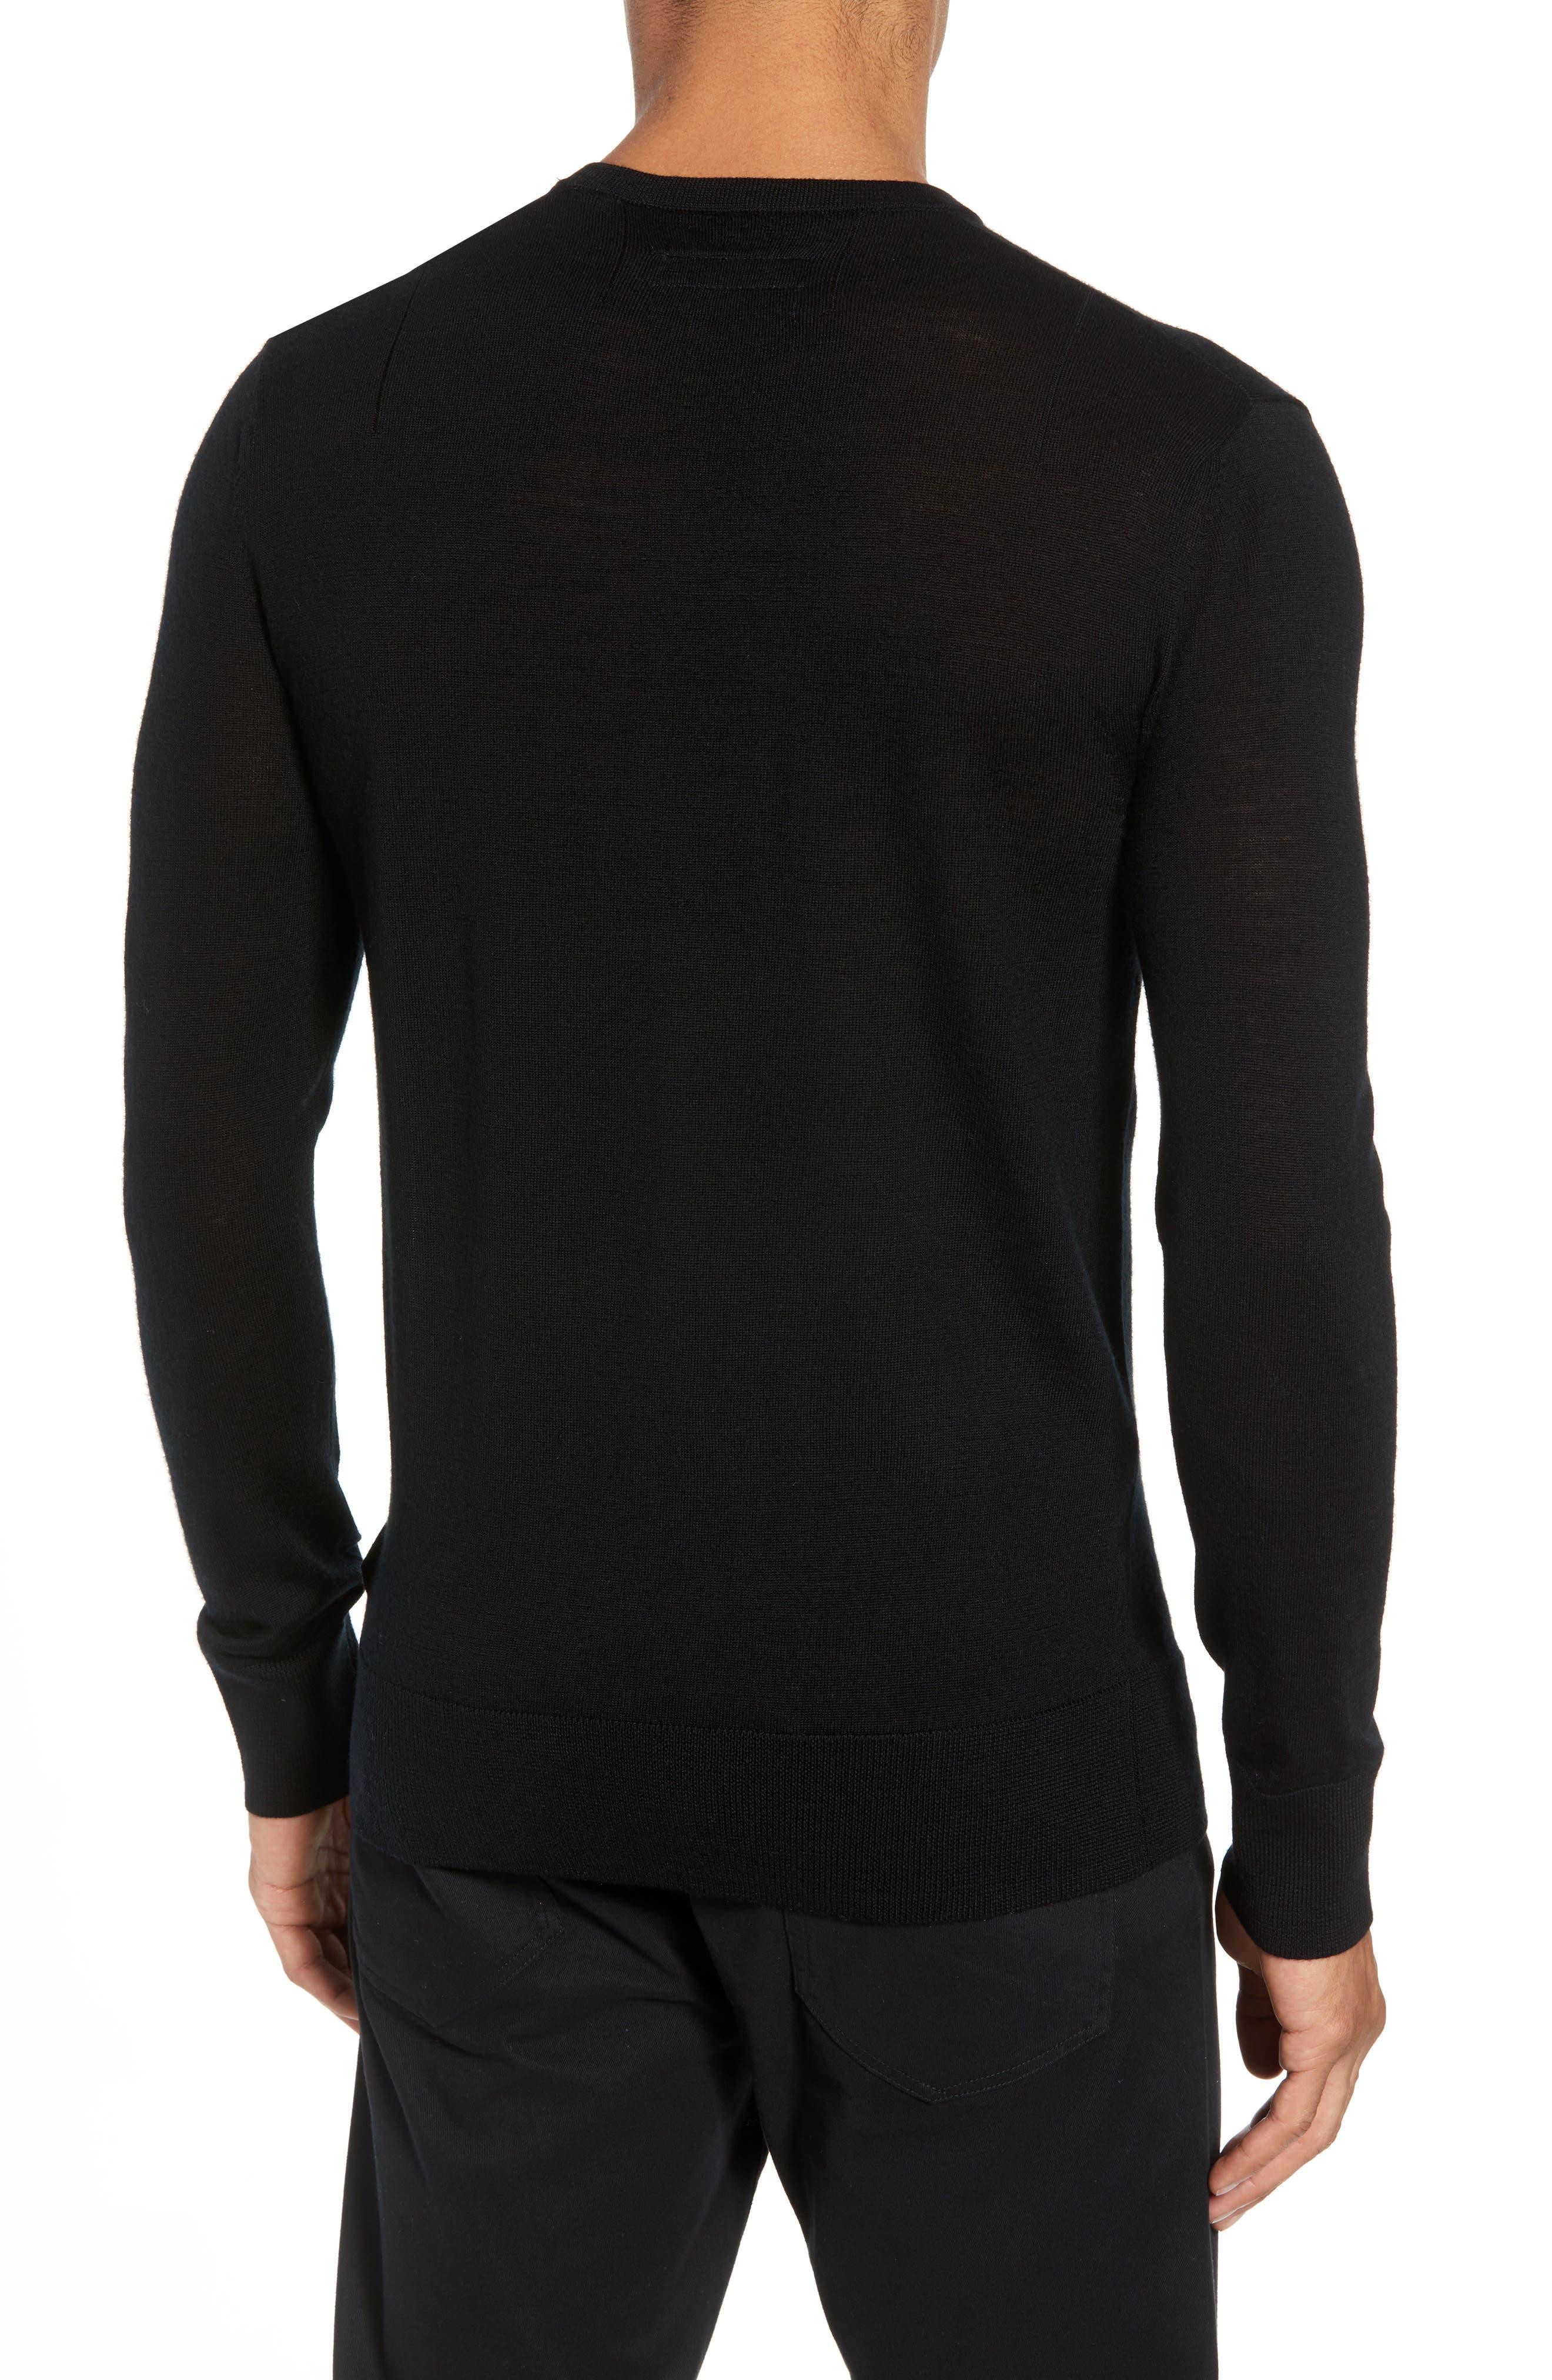 Mode Slim Fit Merino Wool Sweater,                             Alternate thumbnail 2, color,                             Black